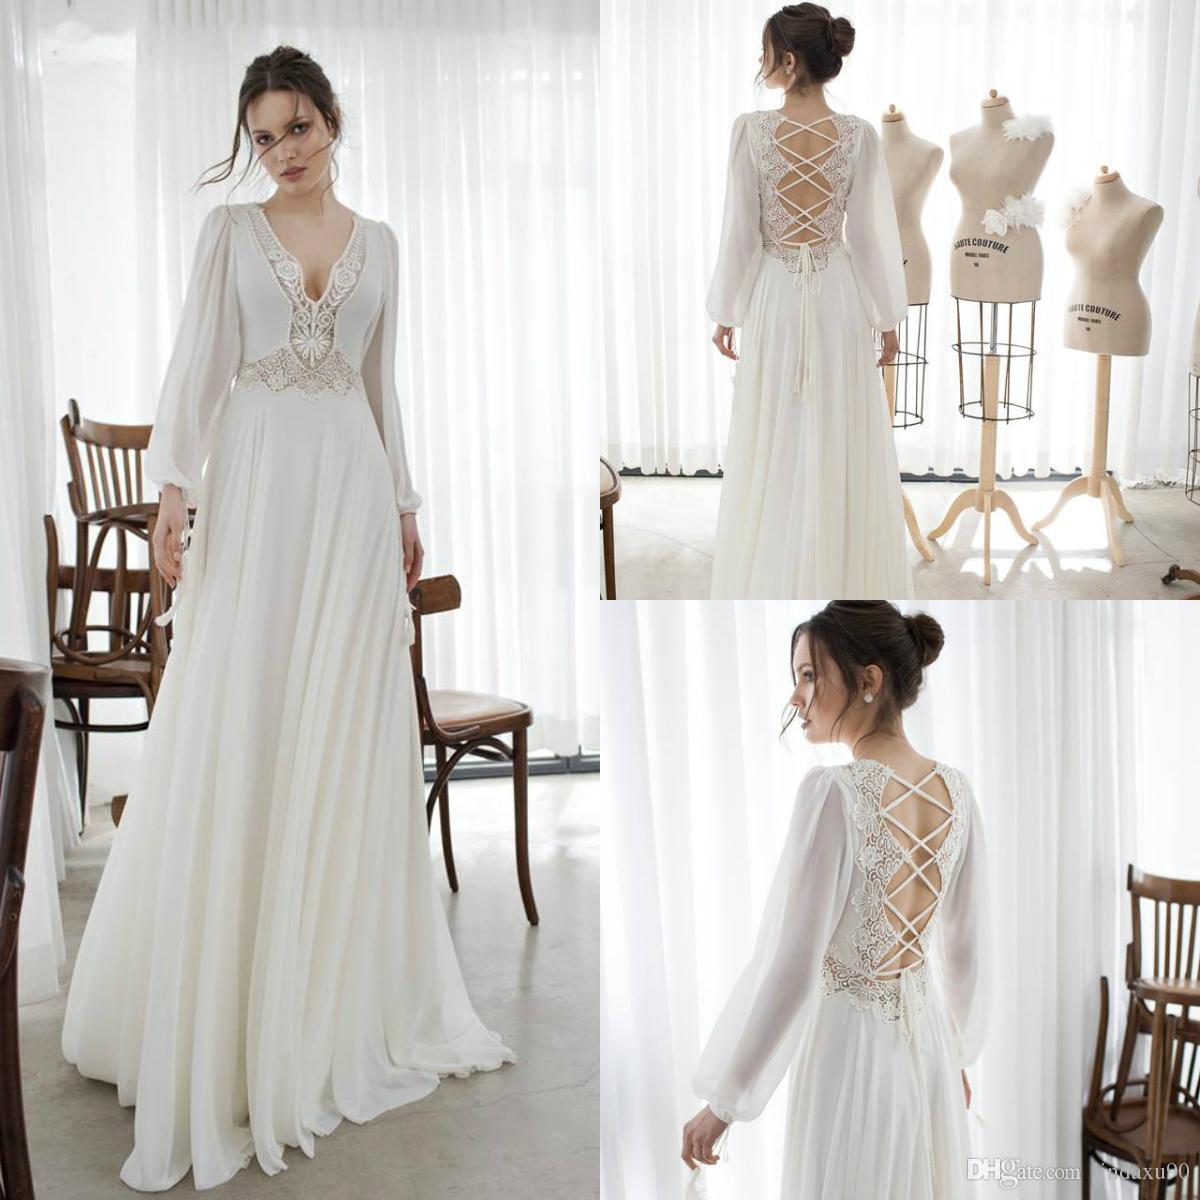 Asaf Dadush 2019 Long Sleeve Boho Wedding Dresses Bohemian Lace Appliqued V Neck Wedding Dress A Line Beach Bridal Gowns Robe De Mariee